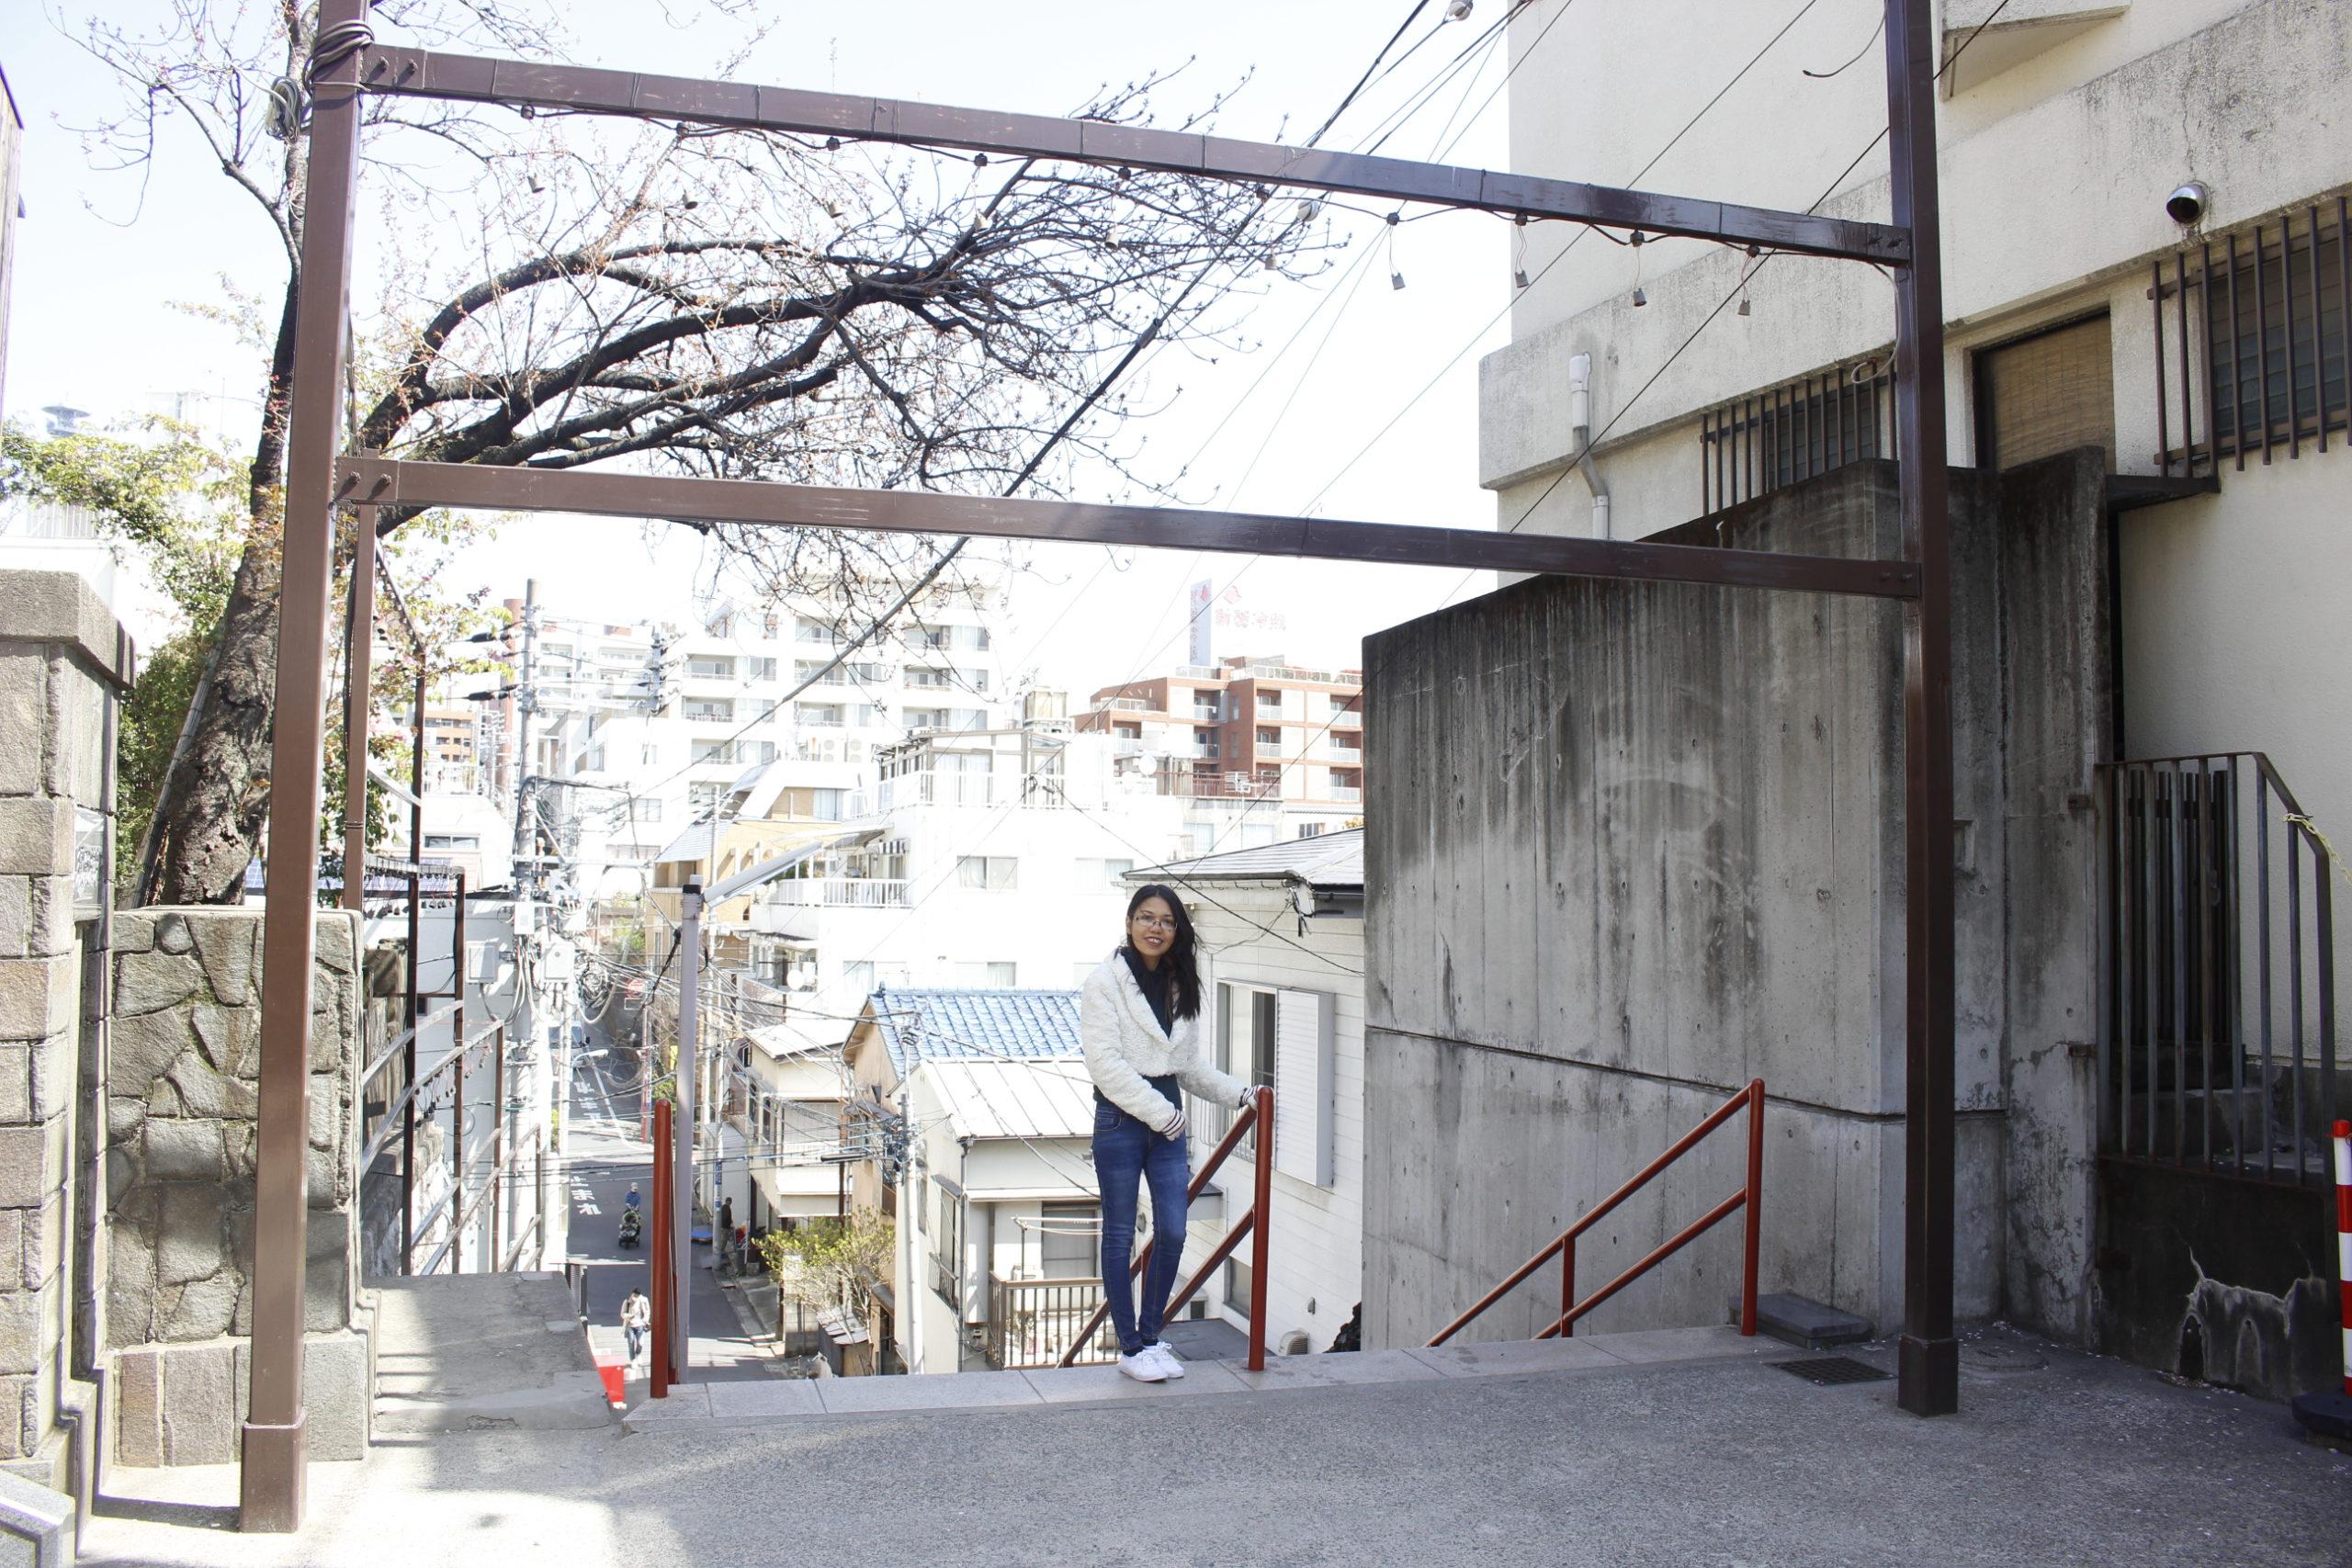 10 Things to do in Shinjuku, Tokyo, Japan (with Sample Itinerary) 0